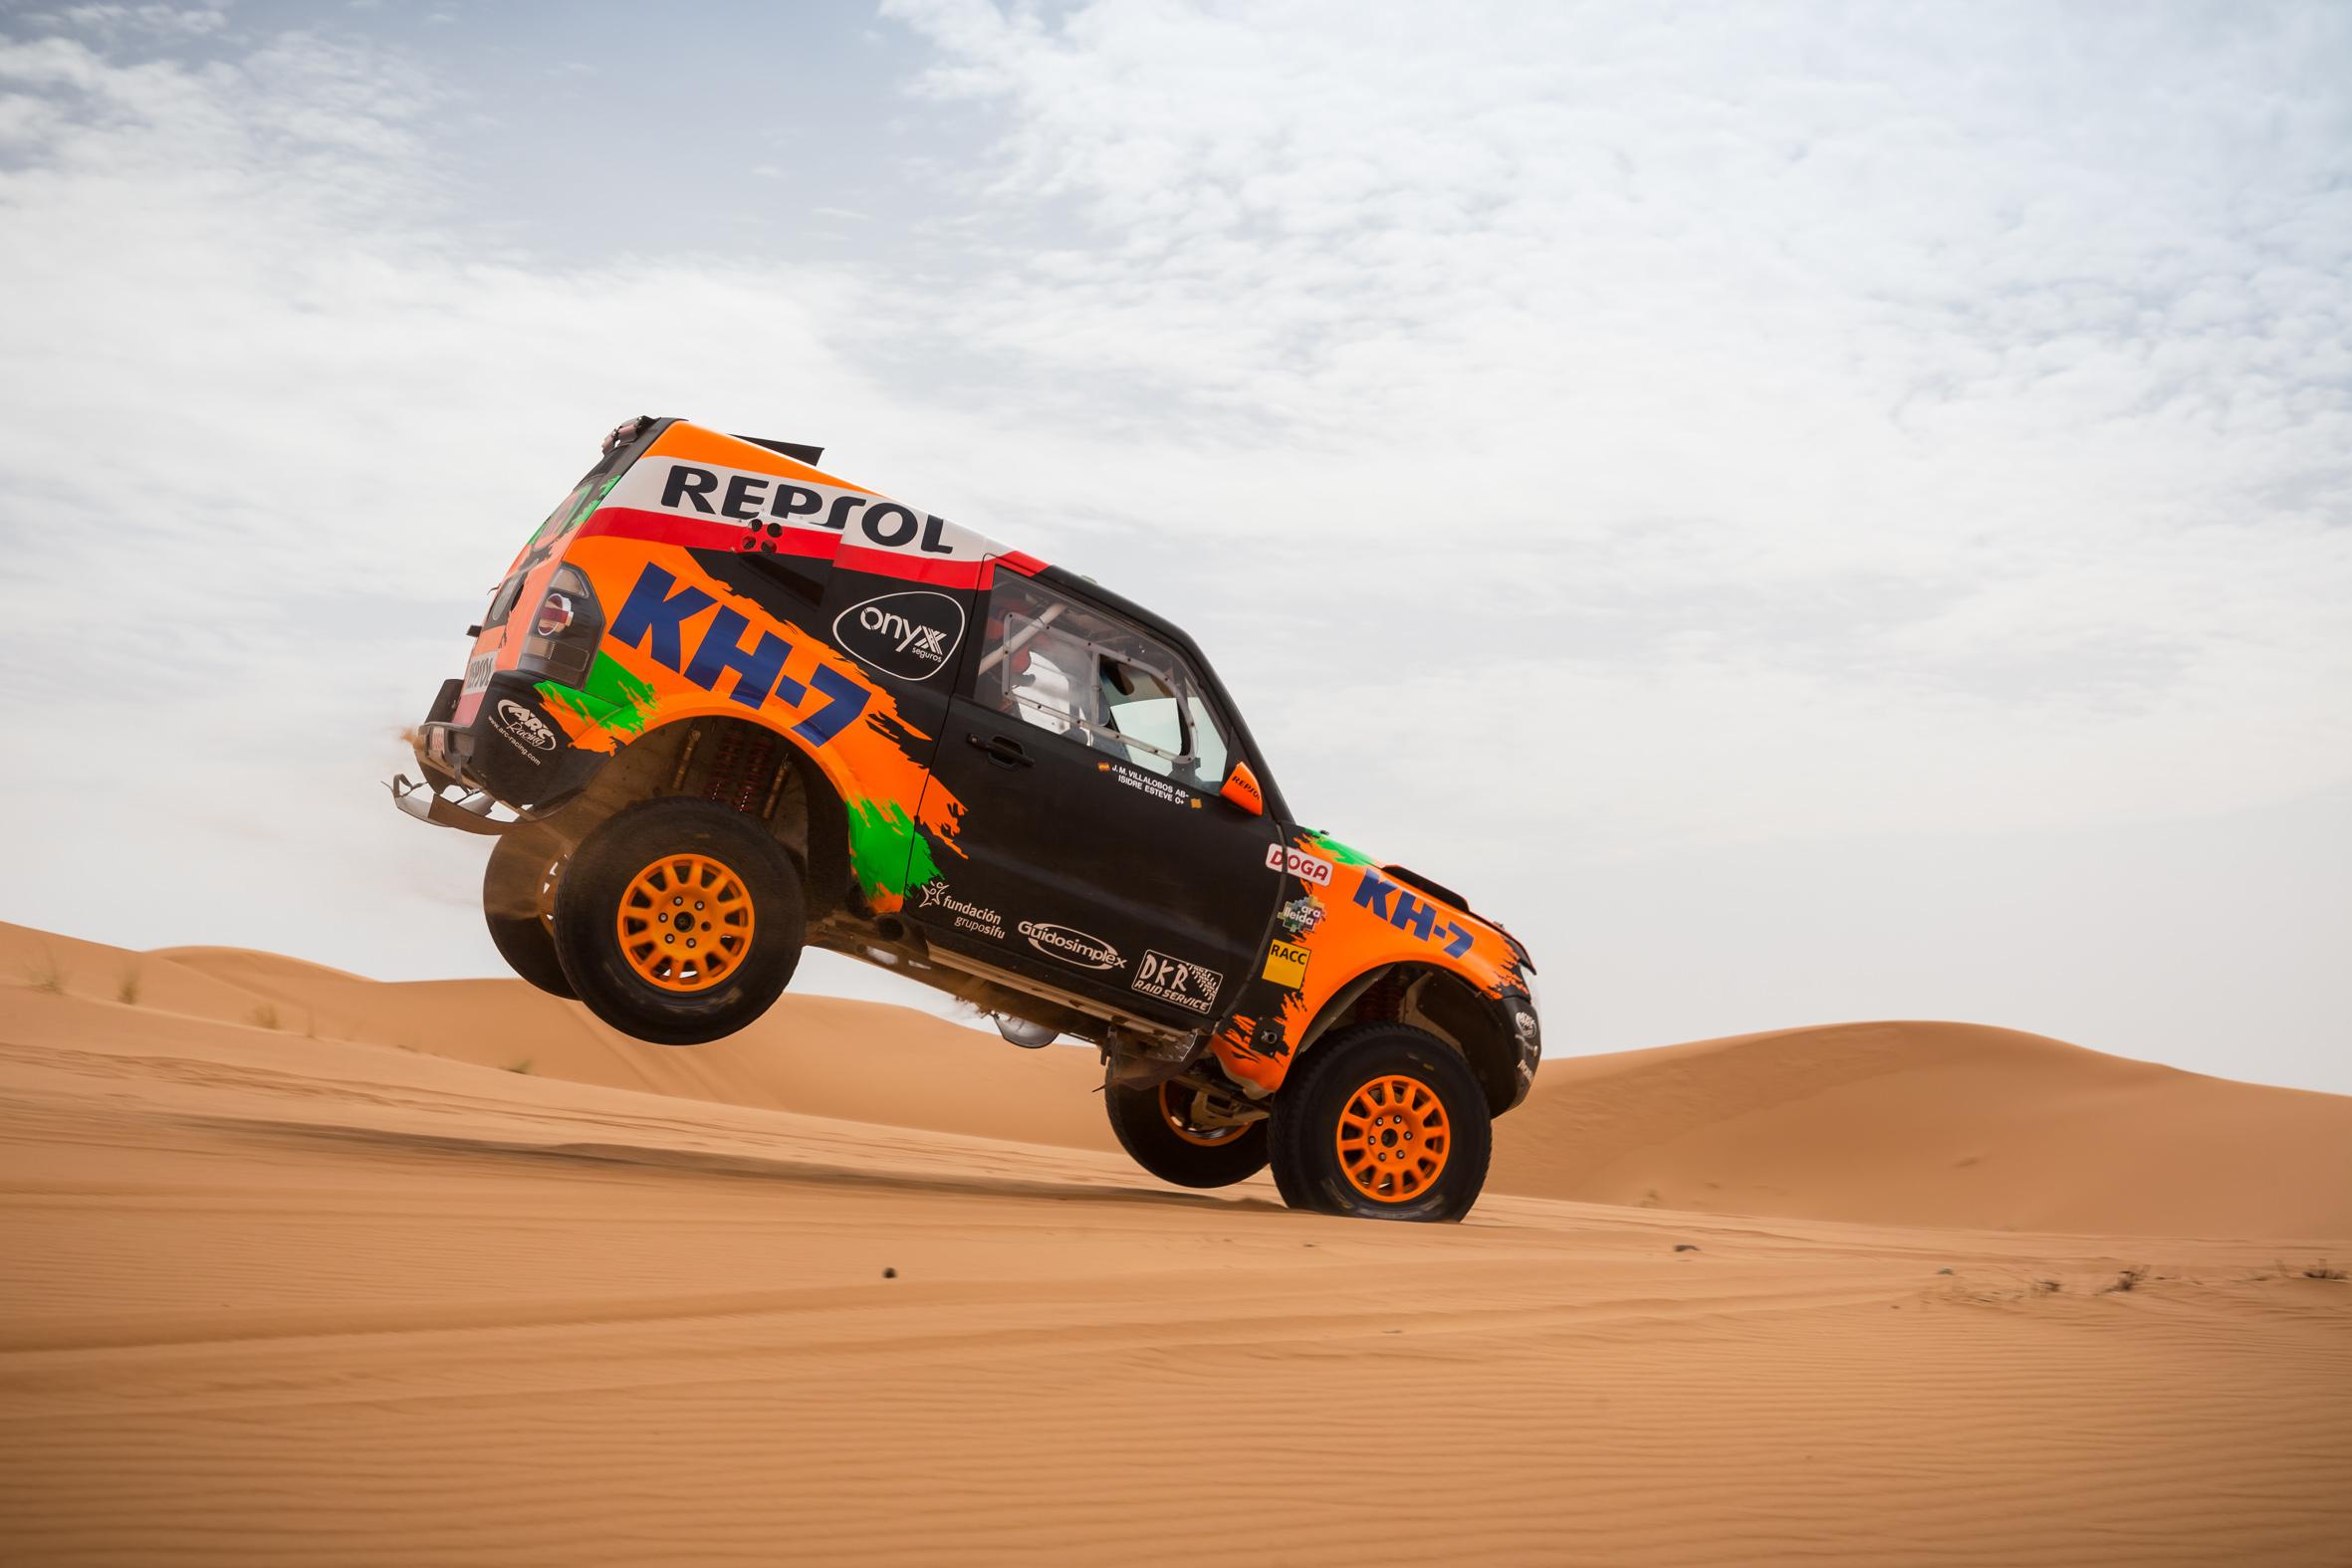 2017 Rallye Raid Dakar Paraguay - Bolivia - Argentina [2-14 Enero] - Página 3 Isidre_Esteve_Test_Marruecos_4